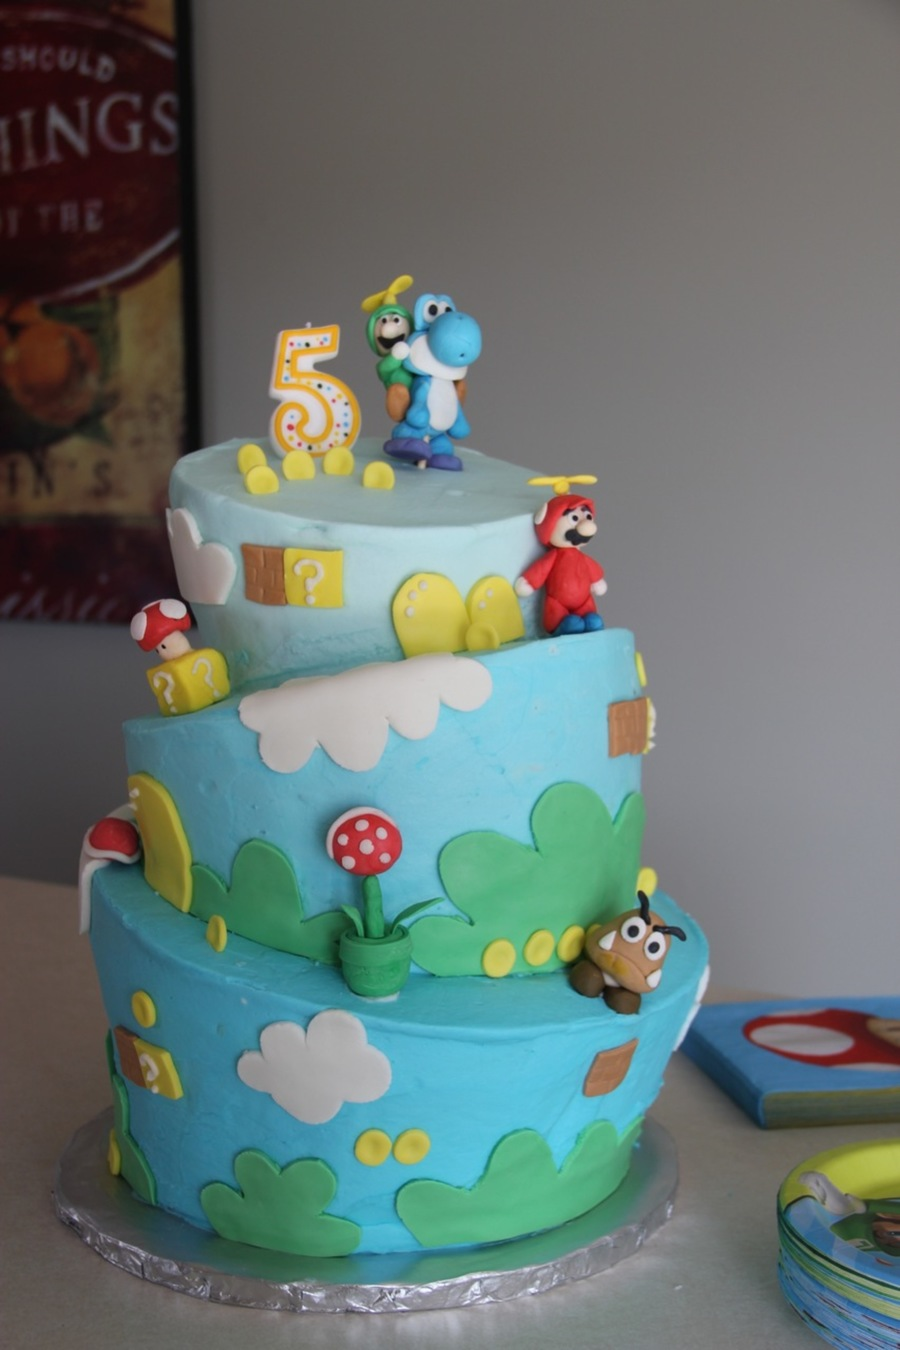 Enjoyable Luigi Birthday Cake Cakecentral Com Funny Birthday Cards Online Unhofree Goldxyz